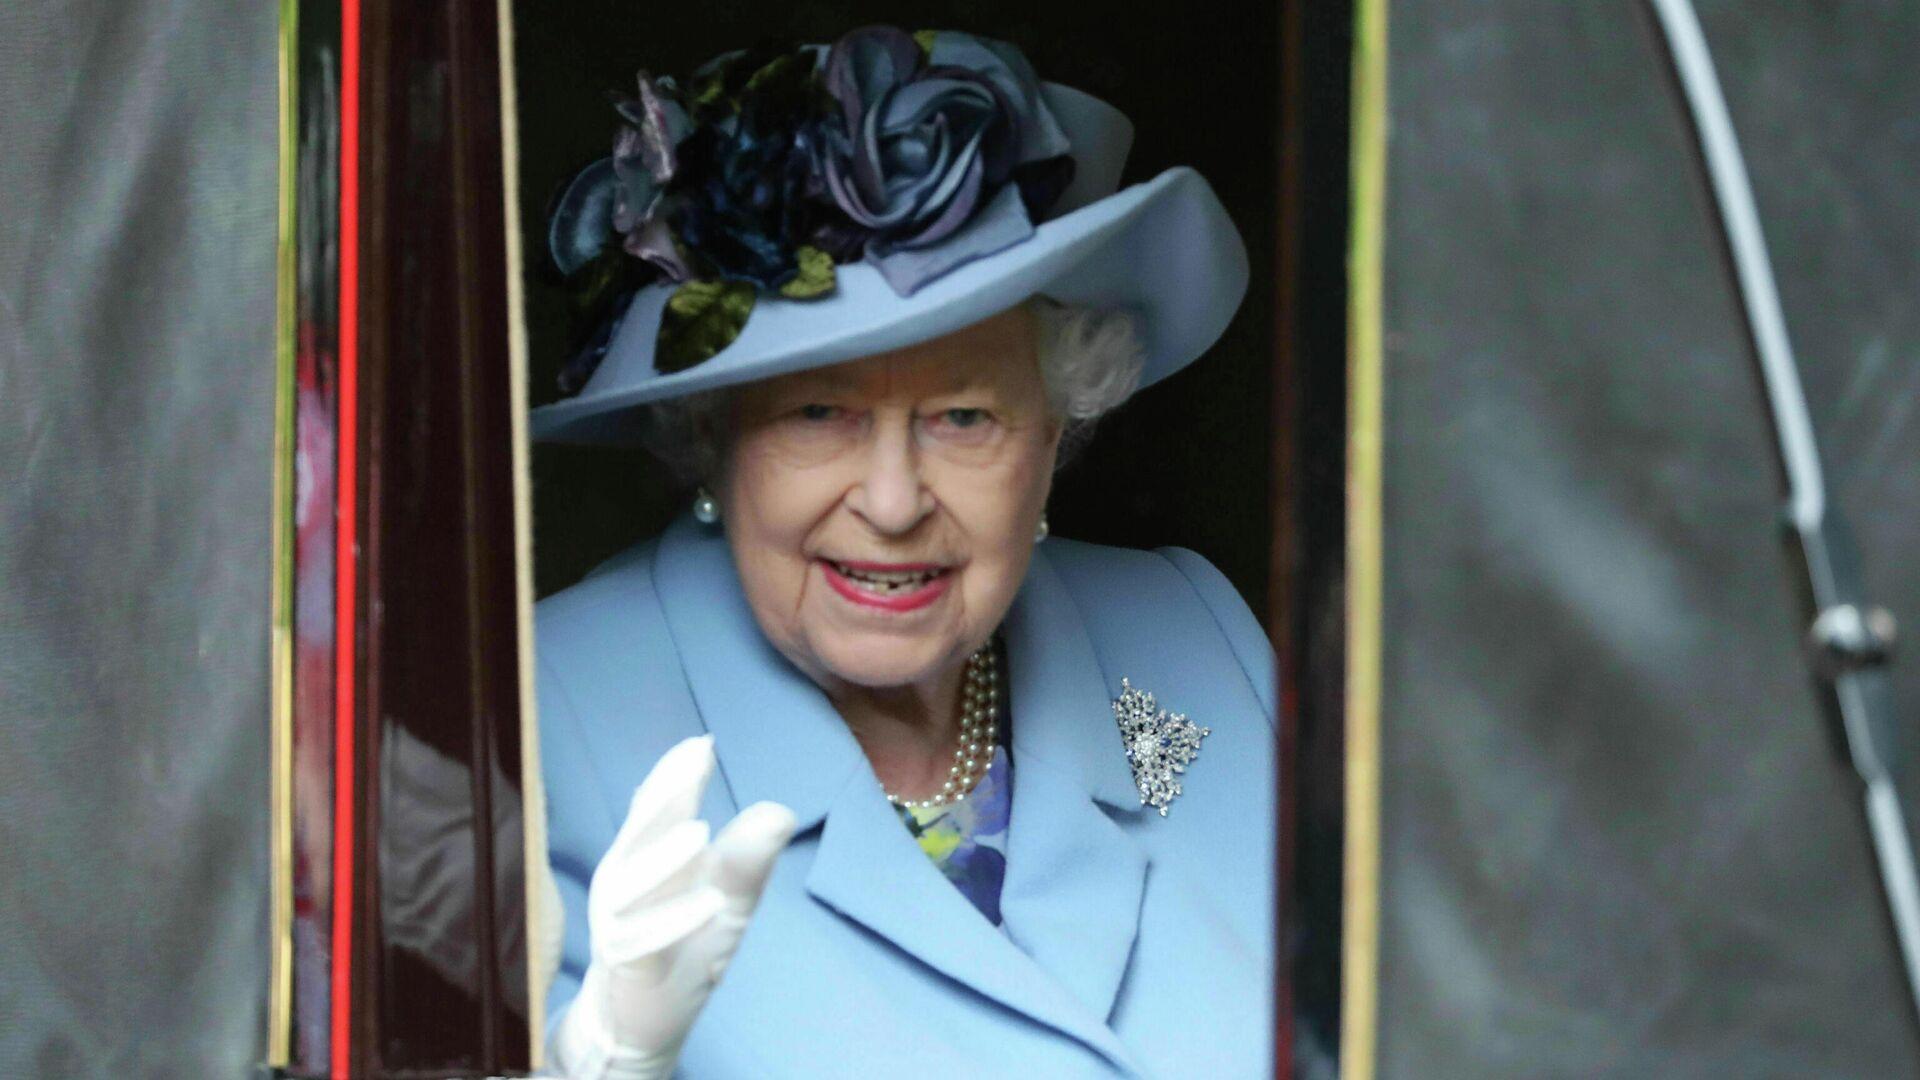 Королева Великобритании Елизавета II по дороге на скачки в Аскоте - РИА Новости, 1920, 09.03.2021